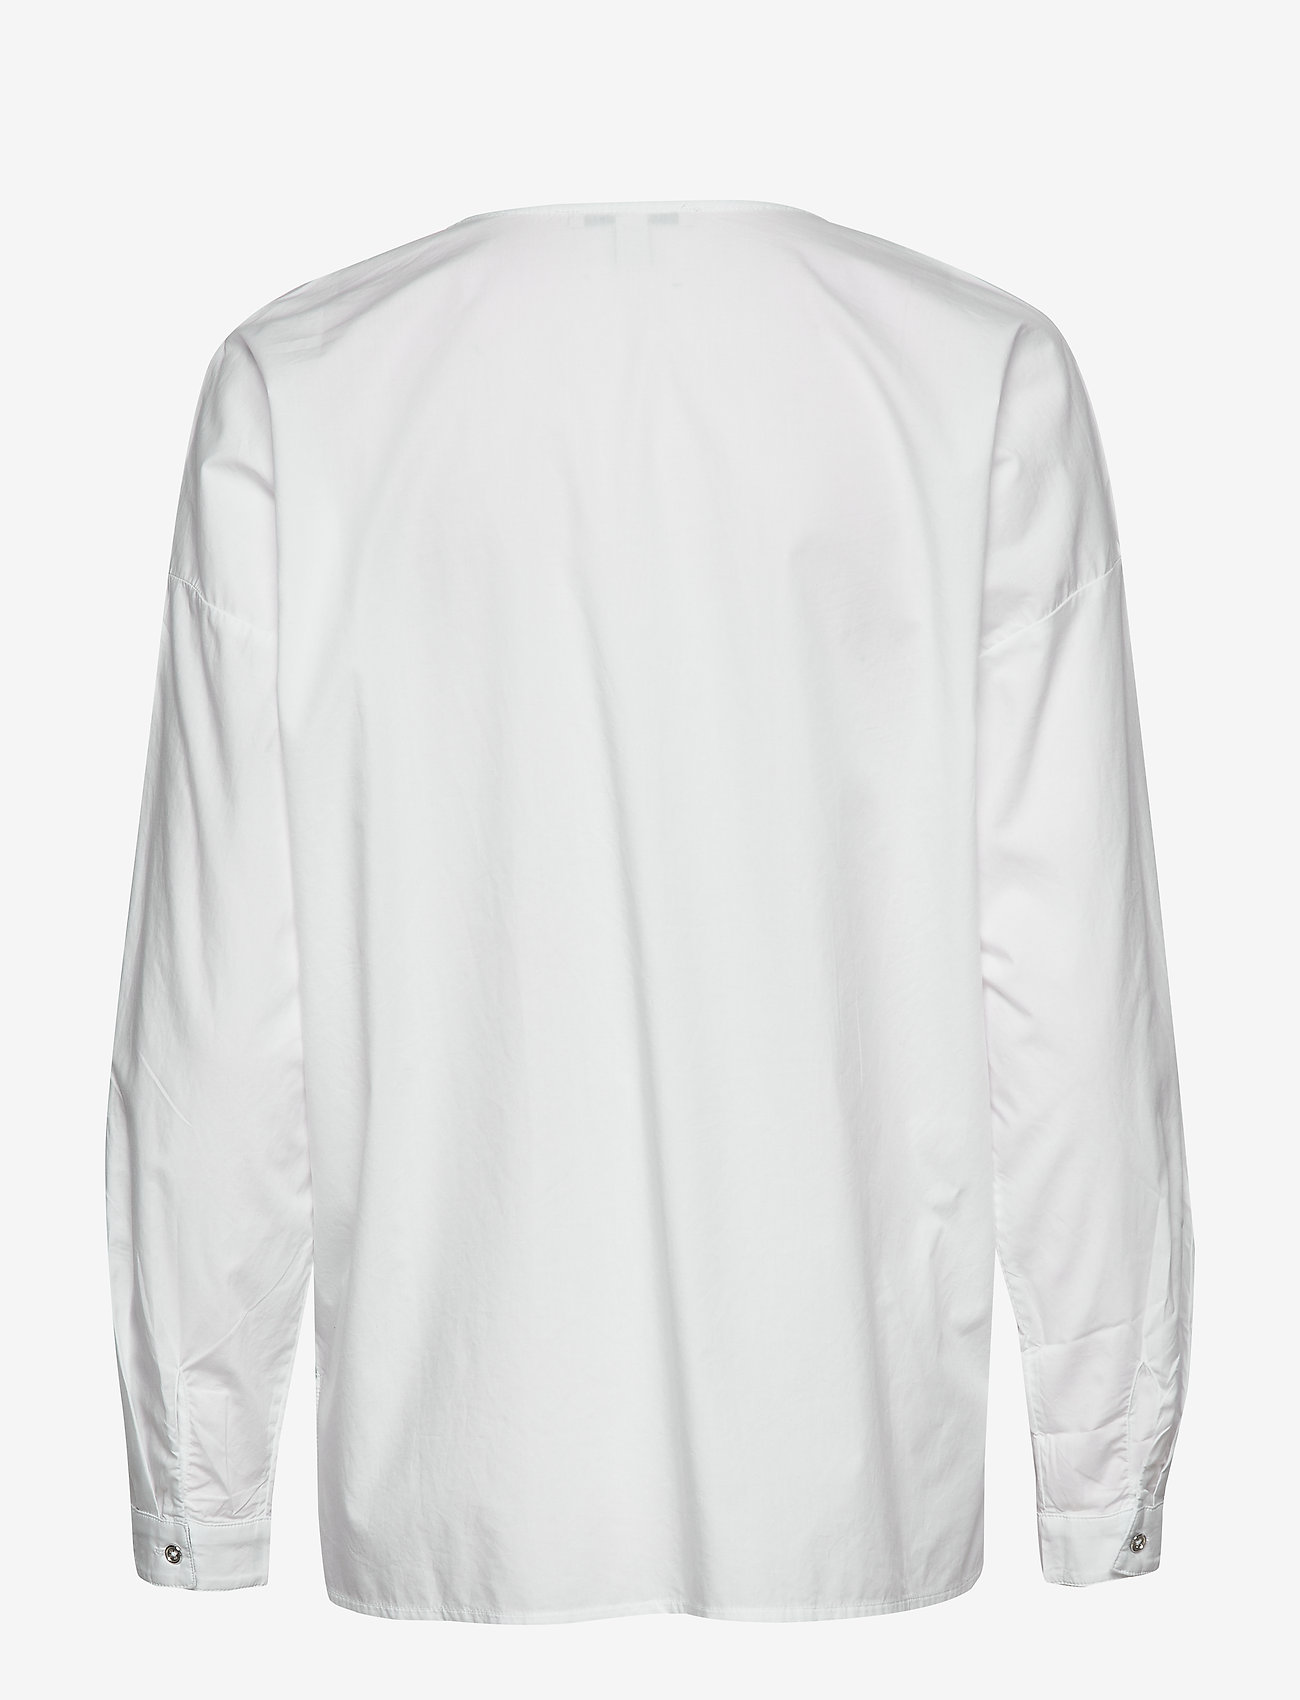 Esprit Casual - Blouses woven - langermede bluser - white - 1